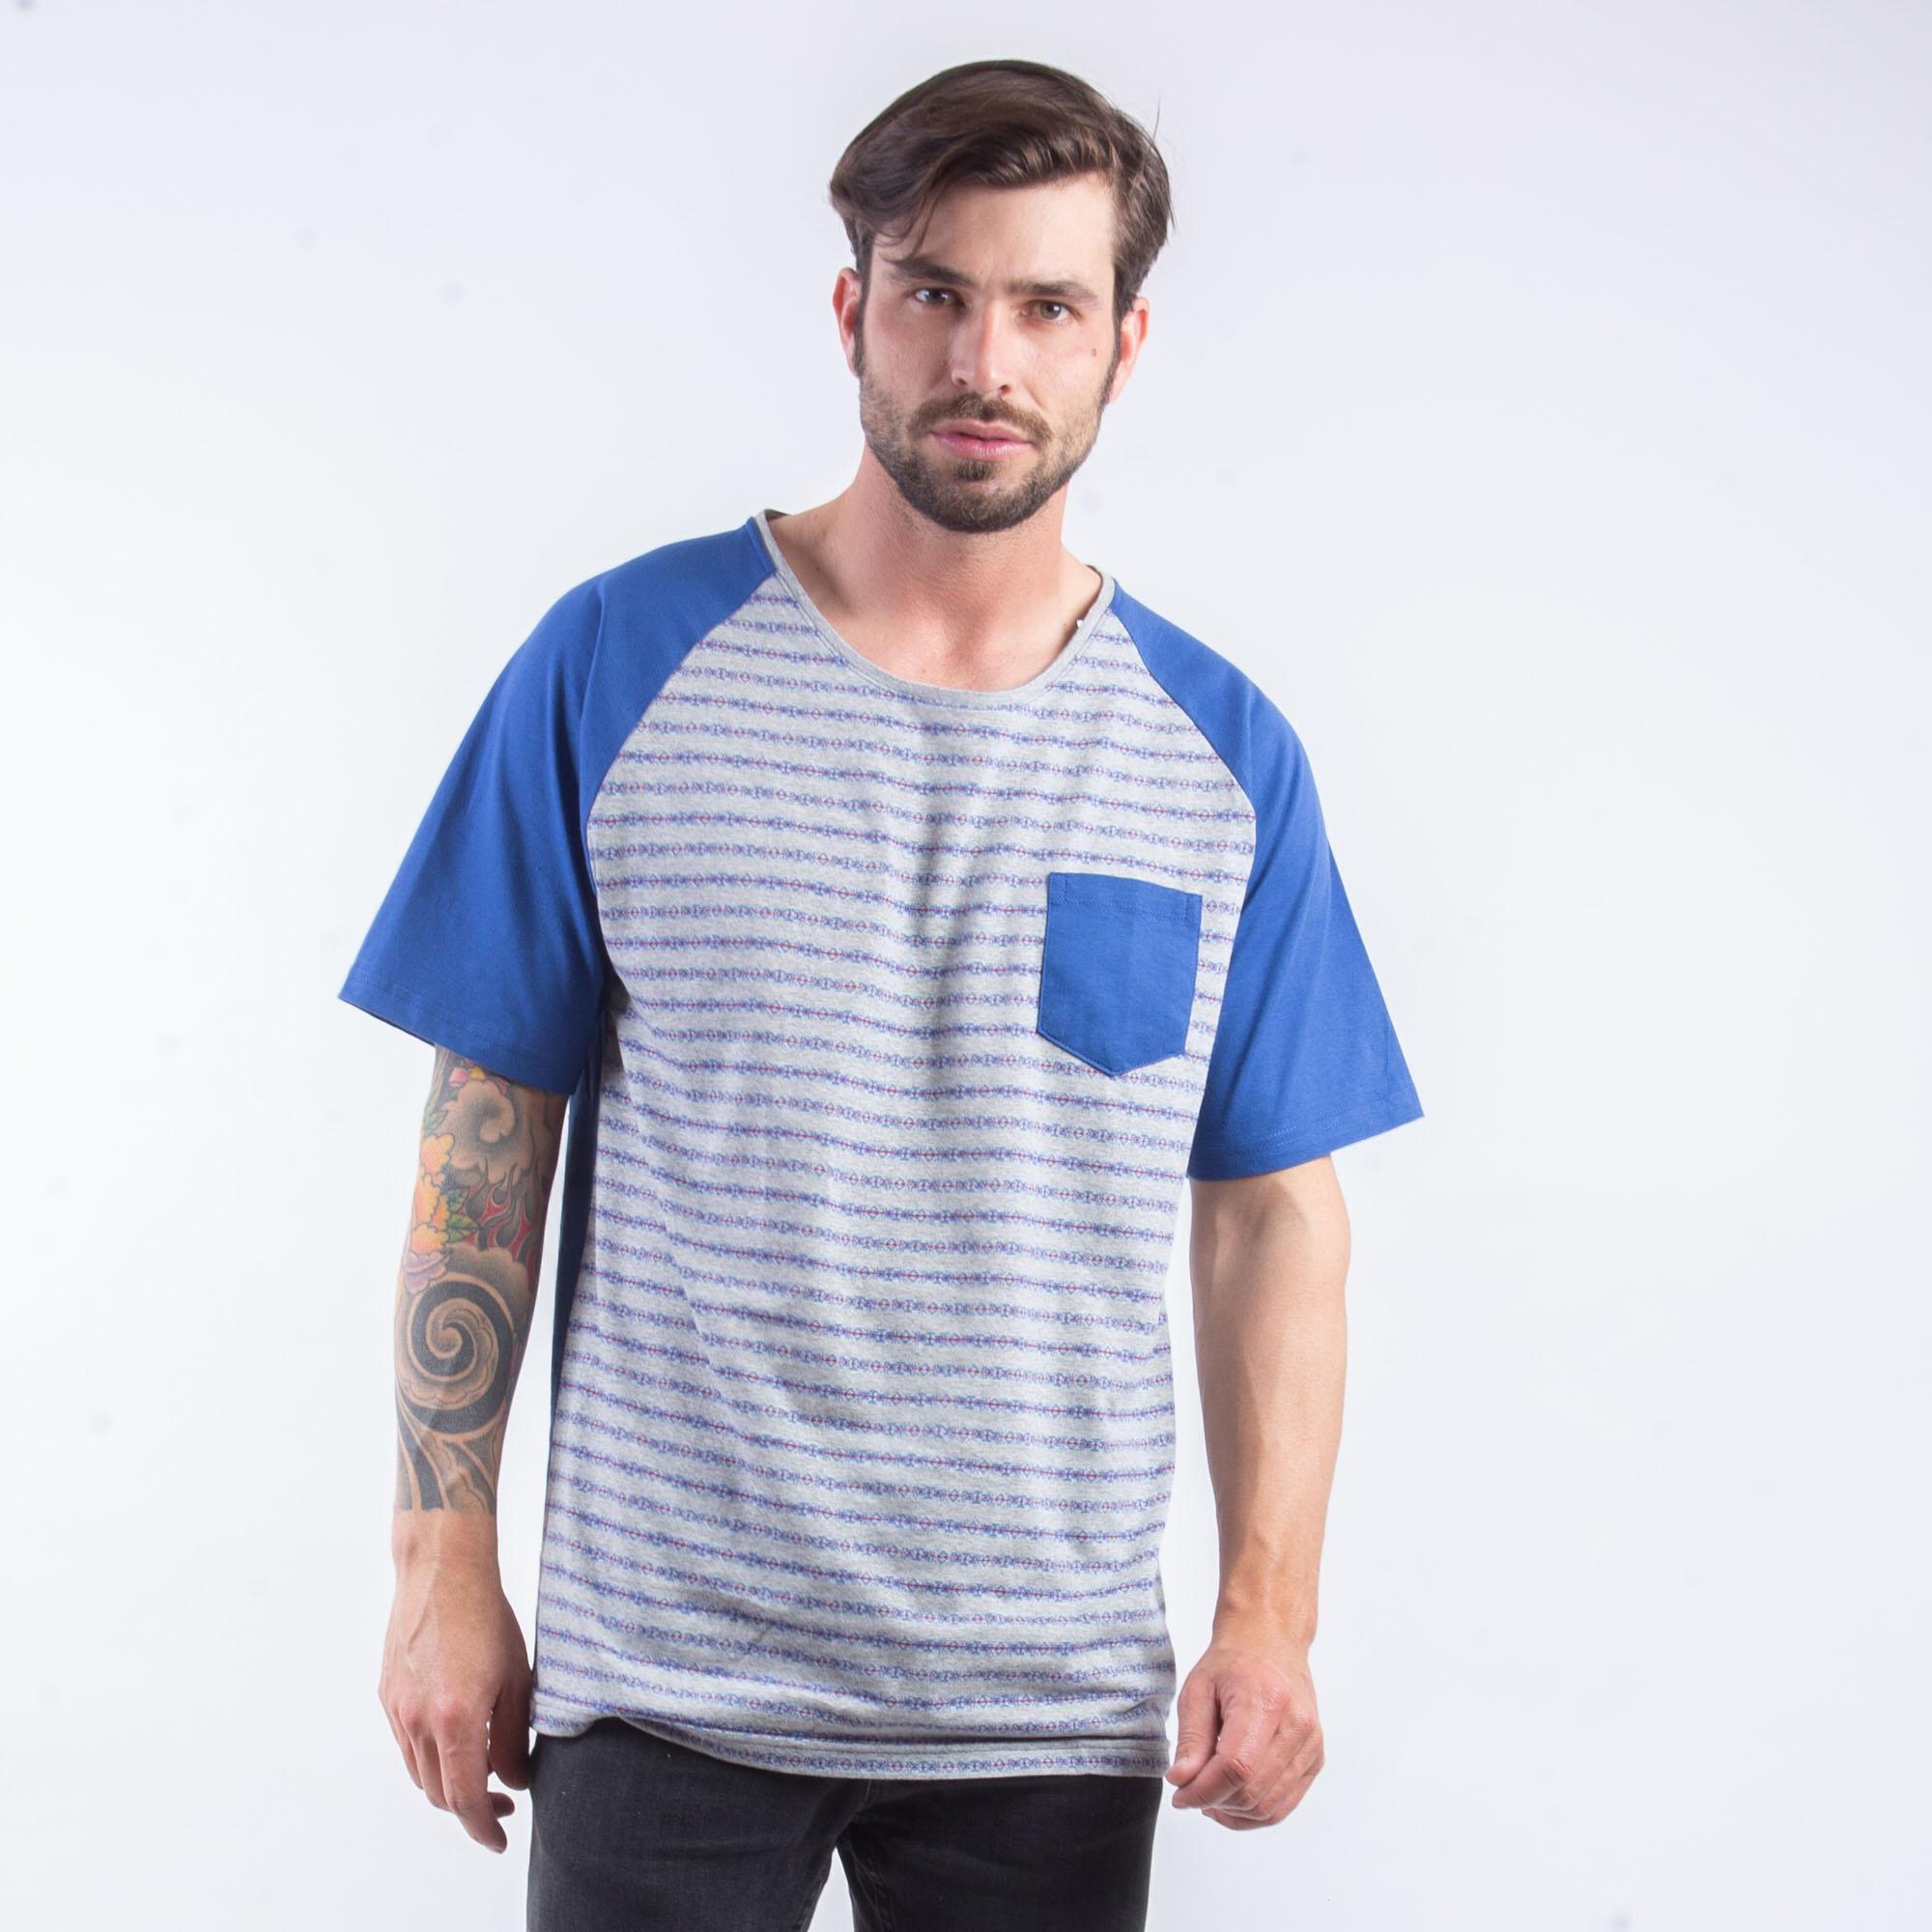 Camiseta Masculina Cinza E Azul Com Bolso